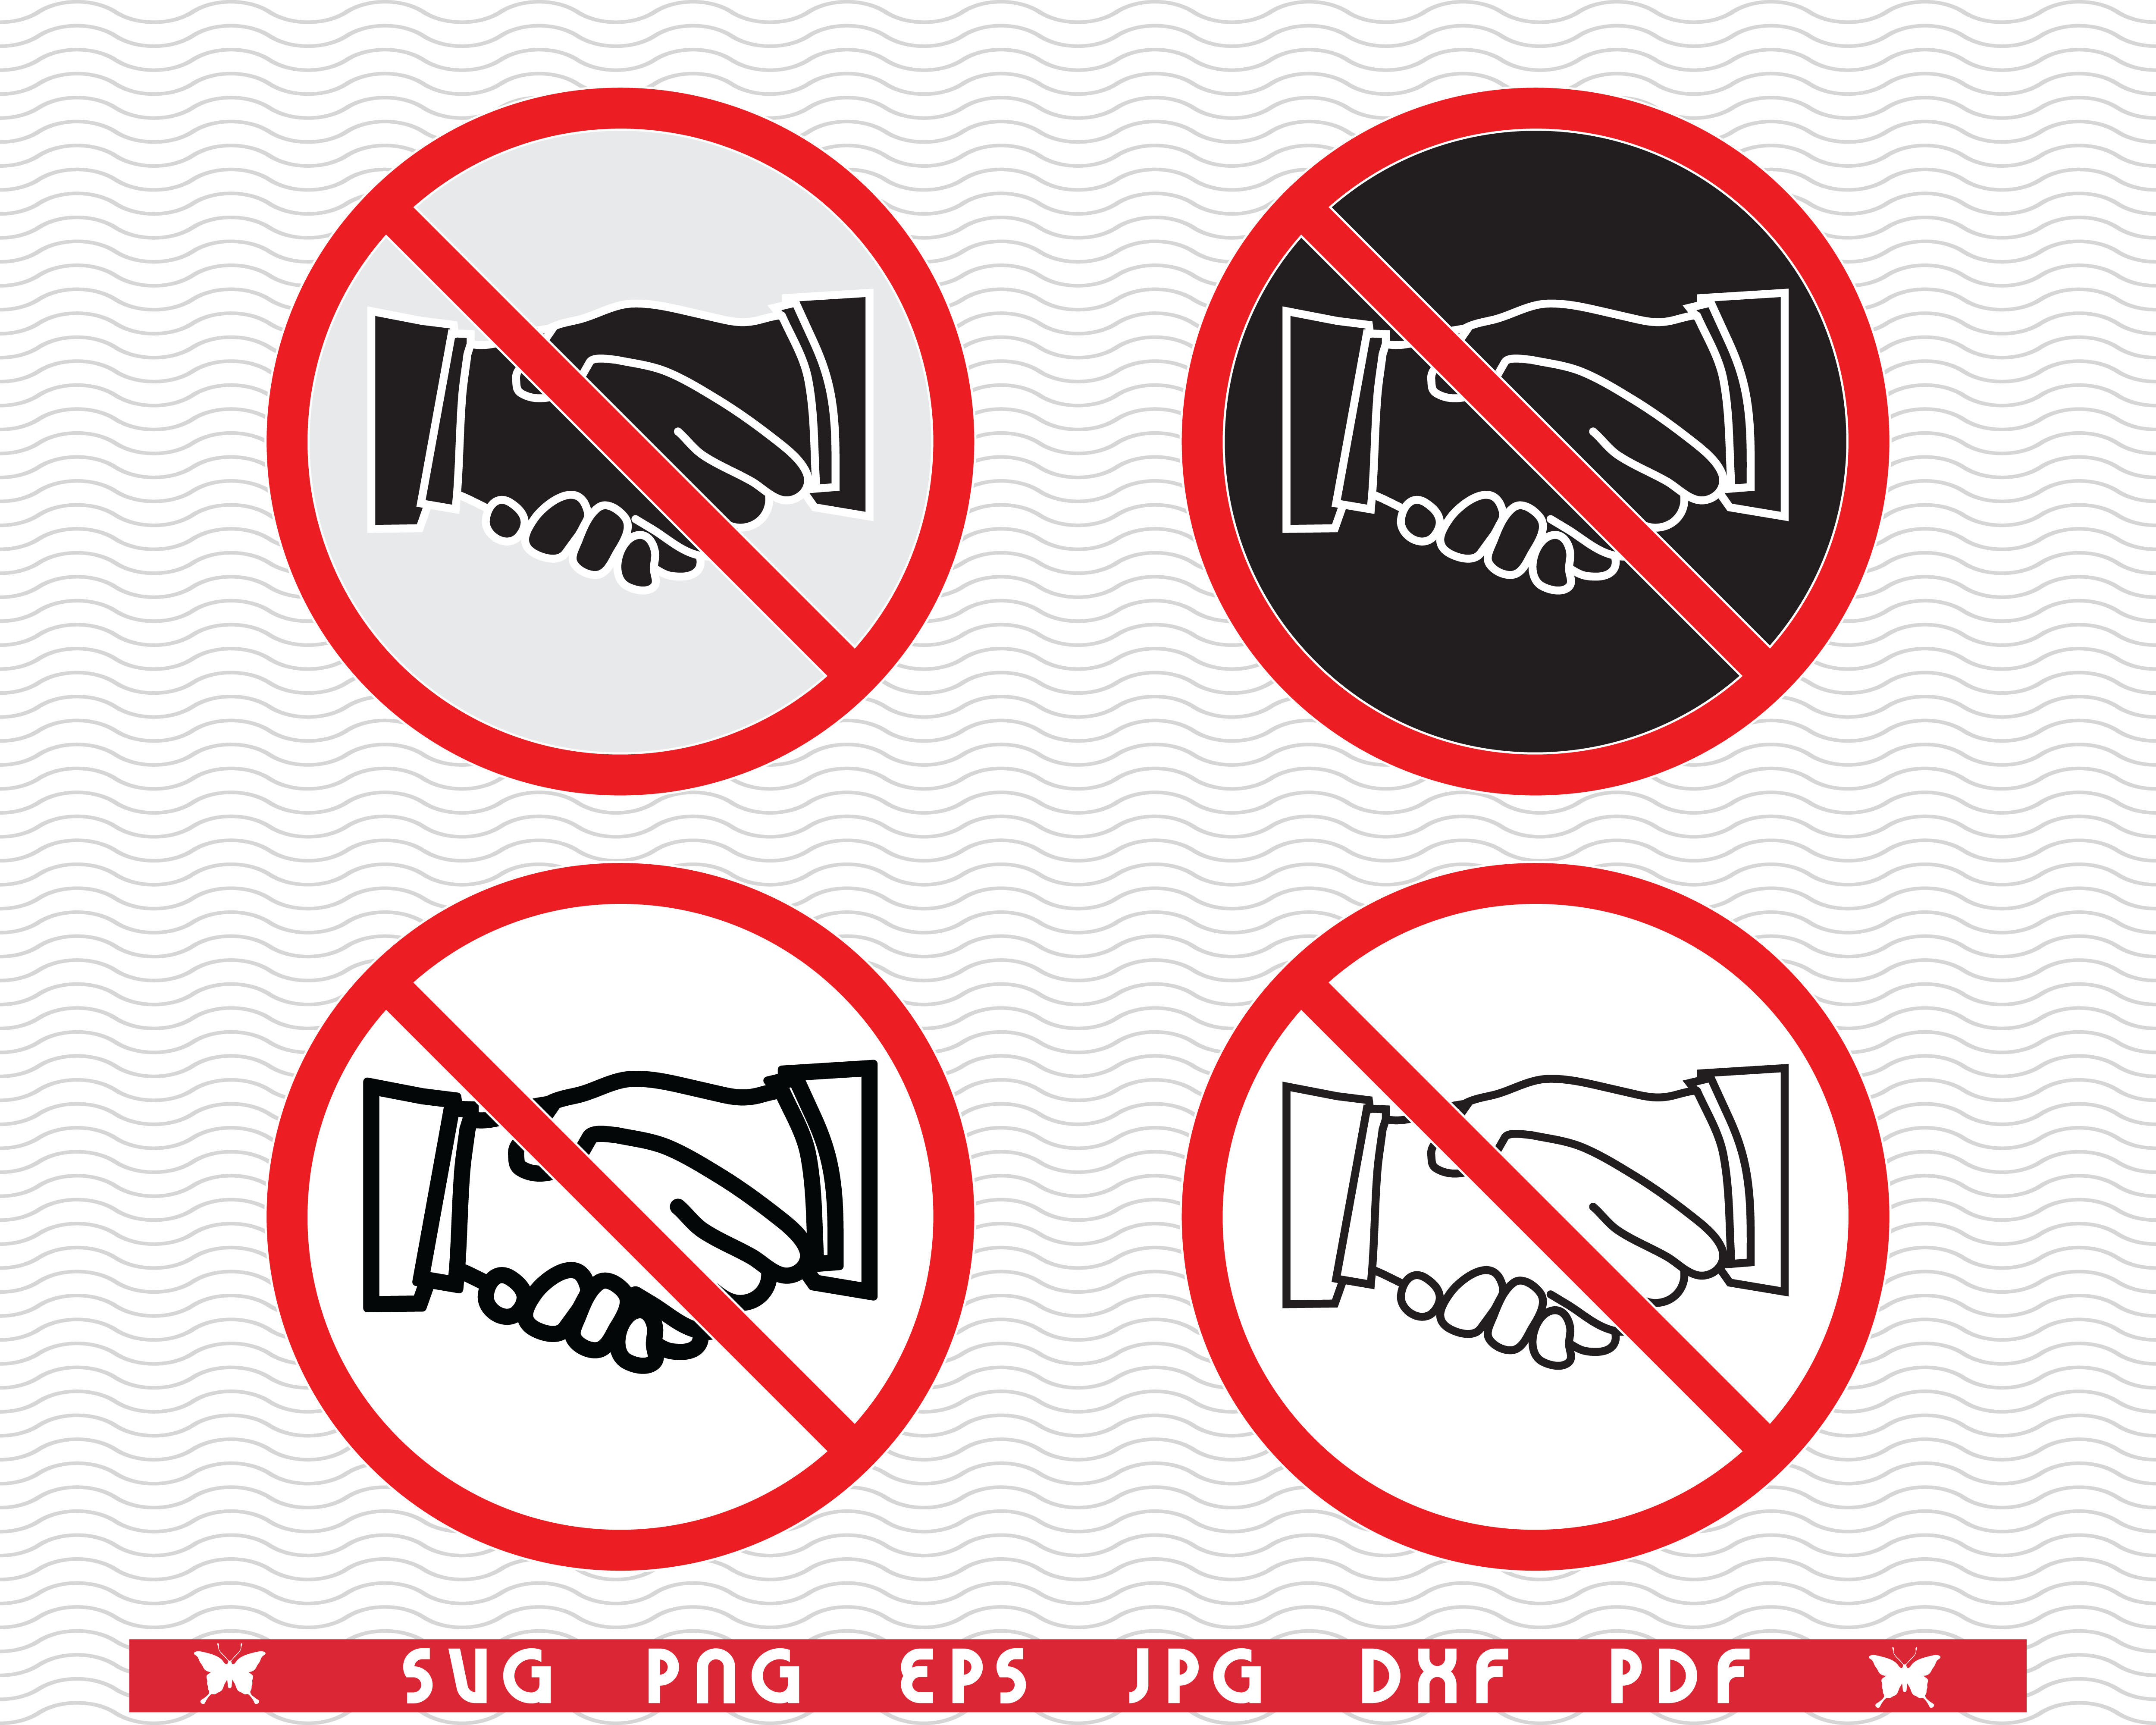 Svg No Handshake Prohibiting Sign By Designstudiorm Thehungryjpeg Com No thanks no hand shake shaking corona safety. the hungry jpeg